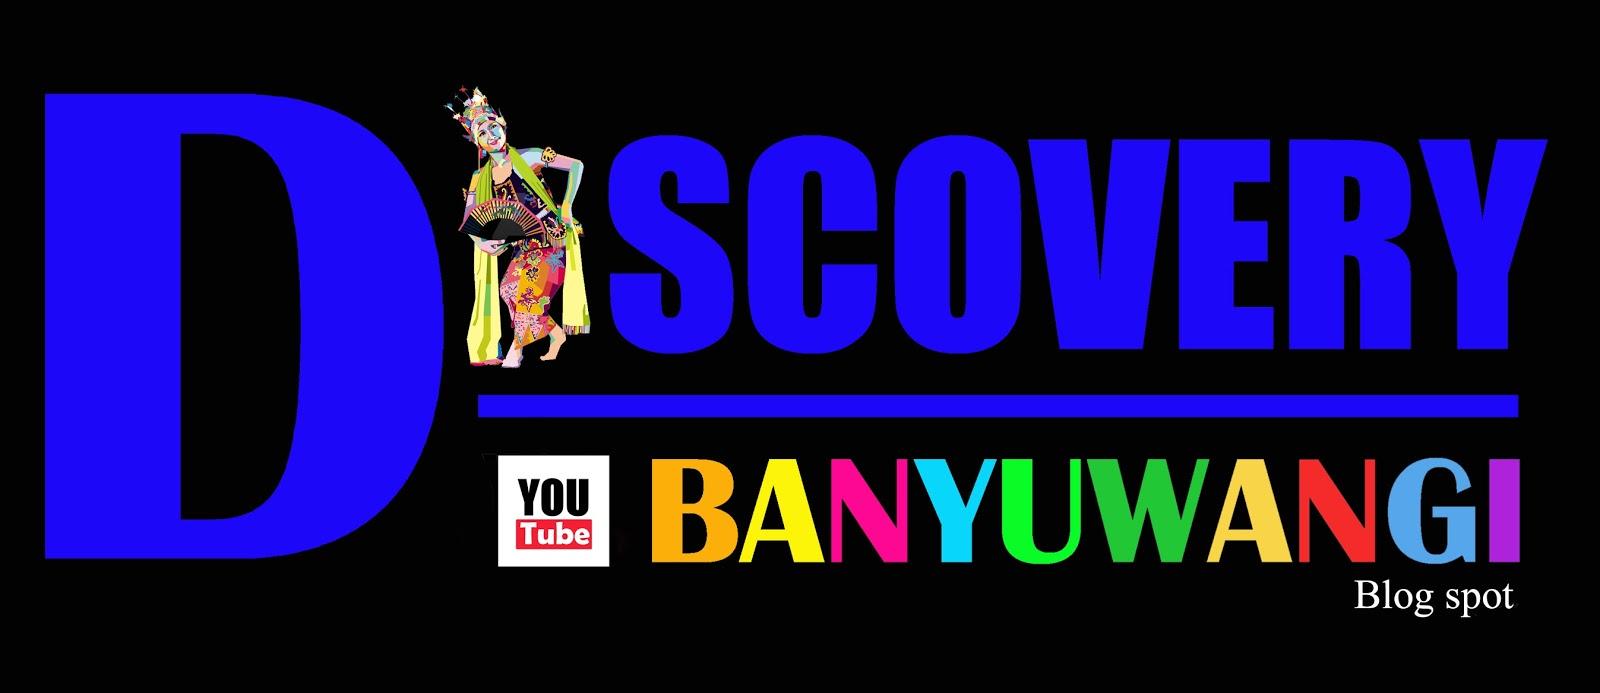 Discovery Banyuwangi Bupati Anas Pantau Penjuru Kabupaten Abdullah Azwar Datang